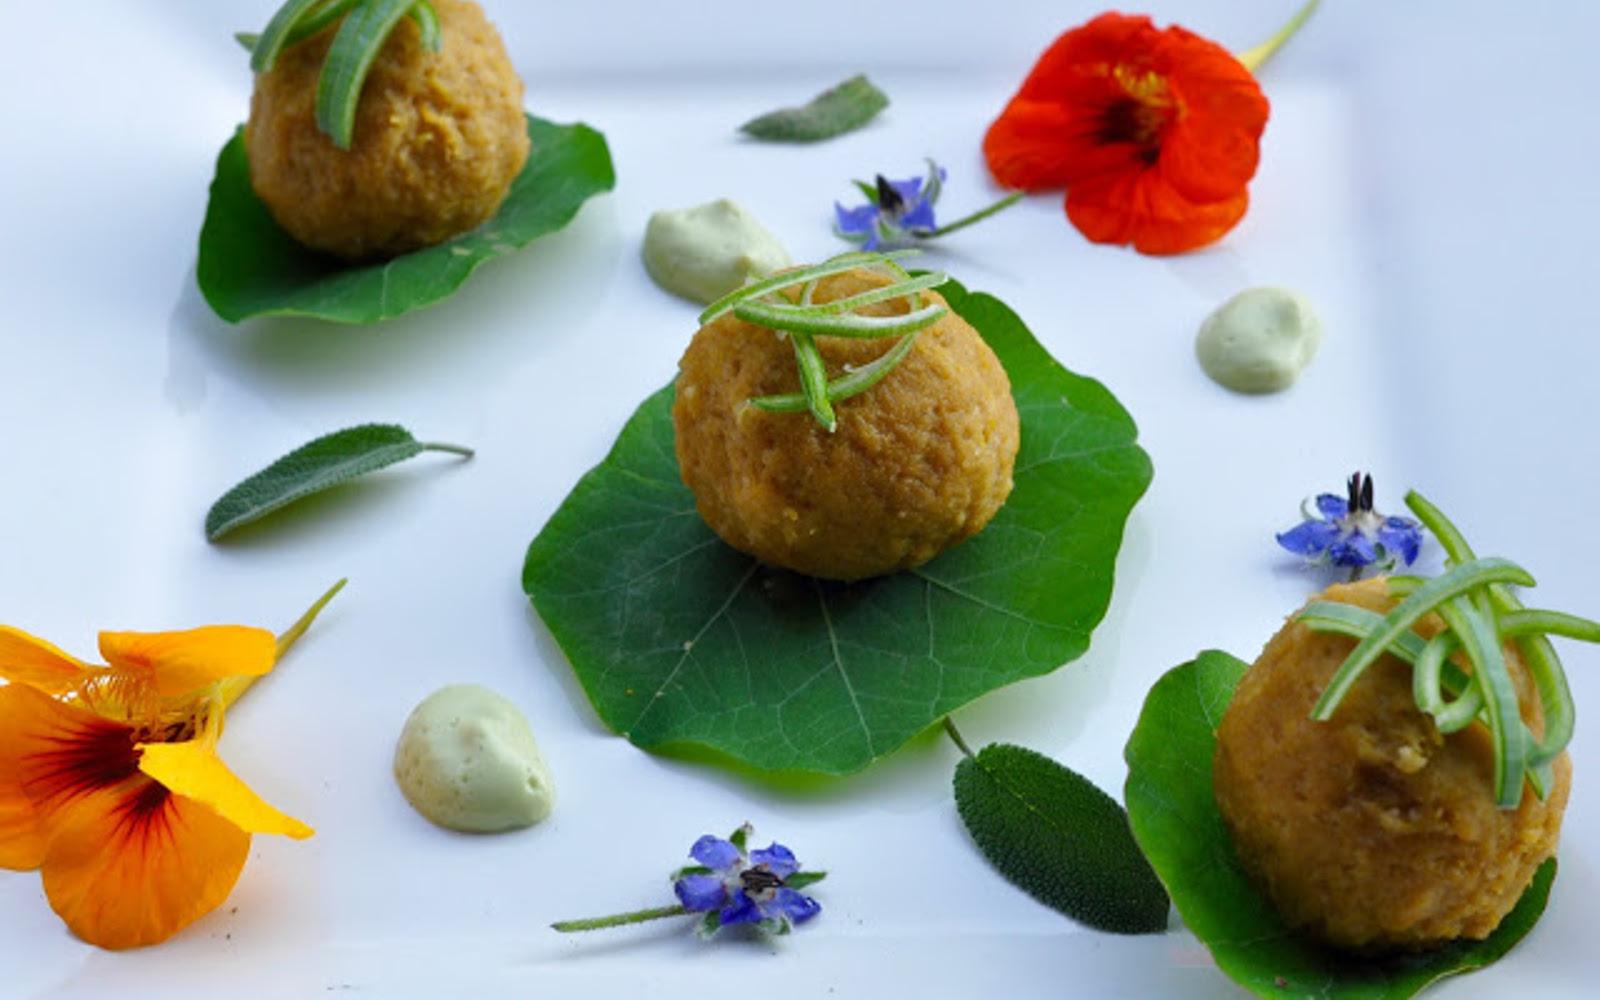 Vegan Gluten-Free Pumpkin Dumplings with Leek Sauce on leaves with garnish